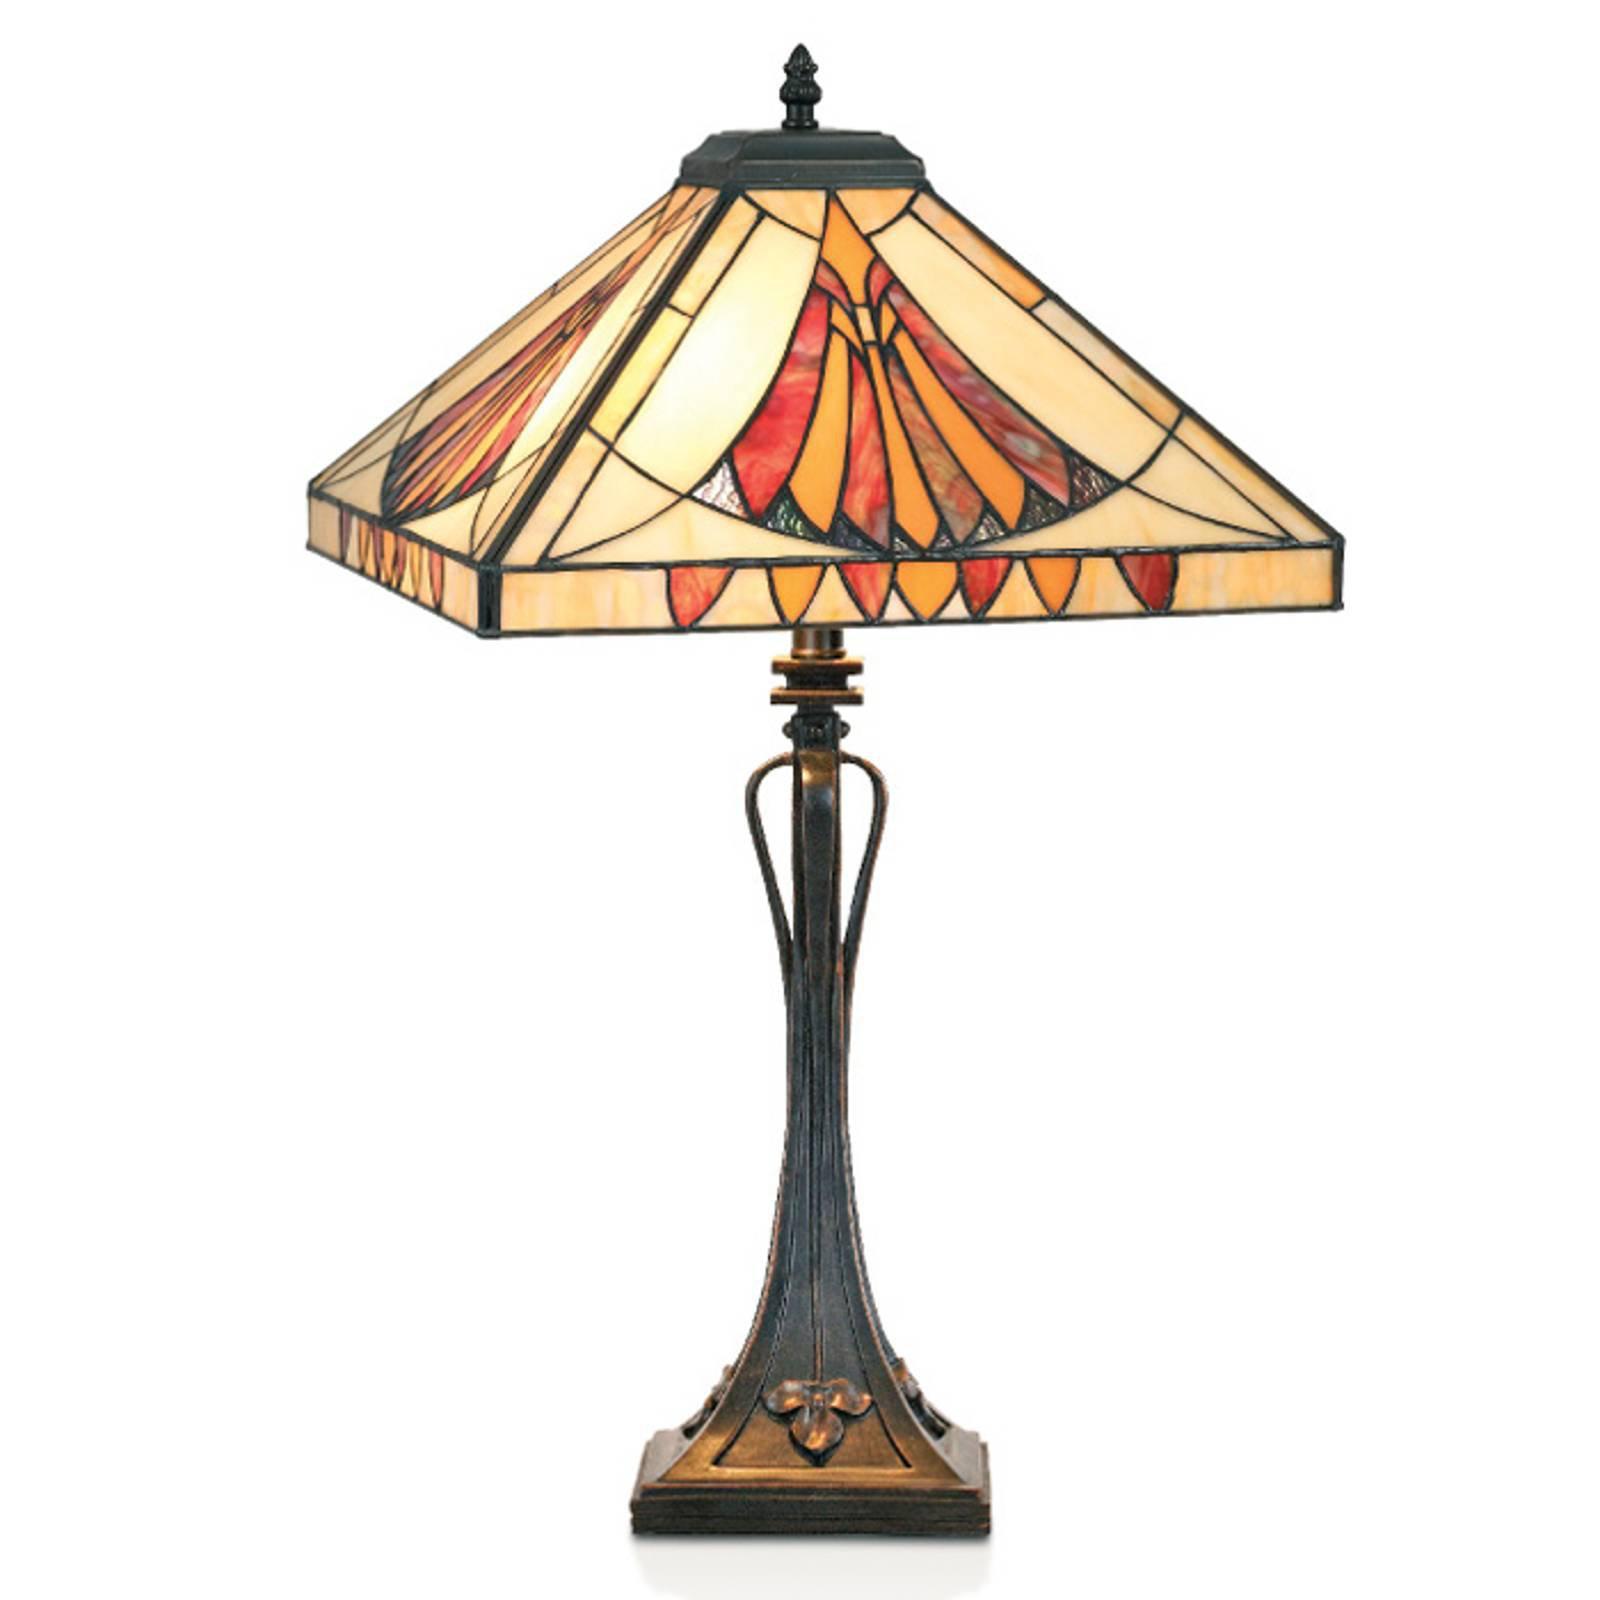 Tiltalende AMALIA bordlampe i Tiffany-stil